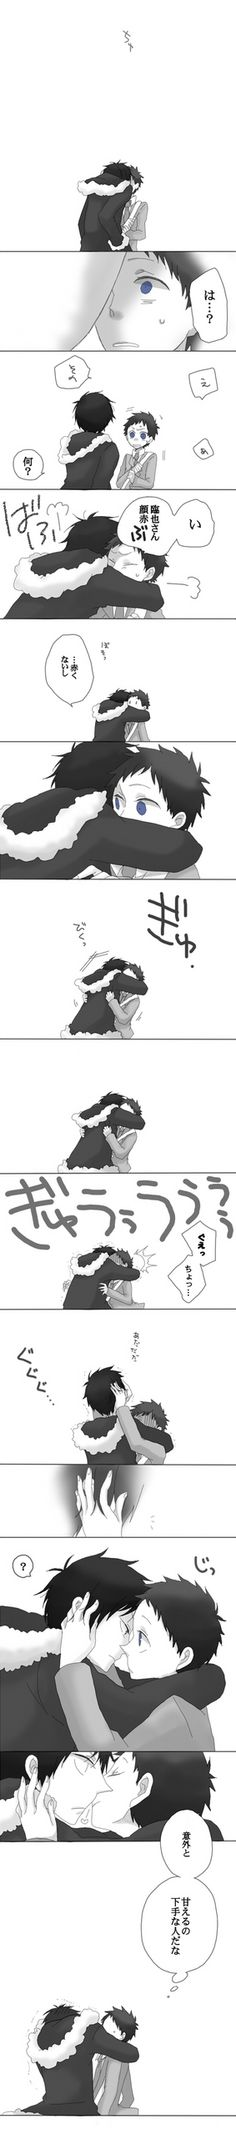 Durarara!!-Izaya x Mikado What is thisbwkvziw!!! This makes me feel uncomfortable